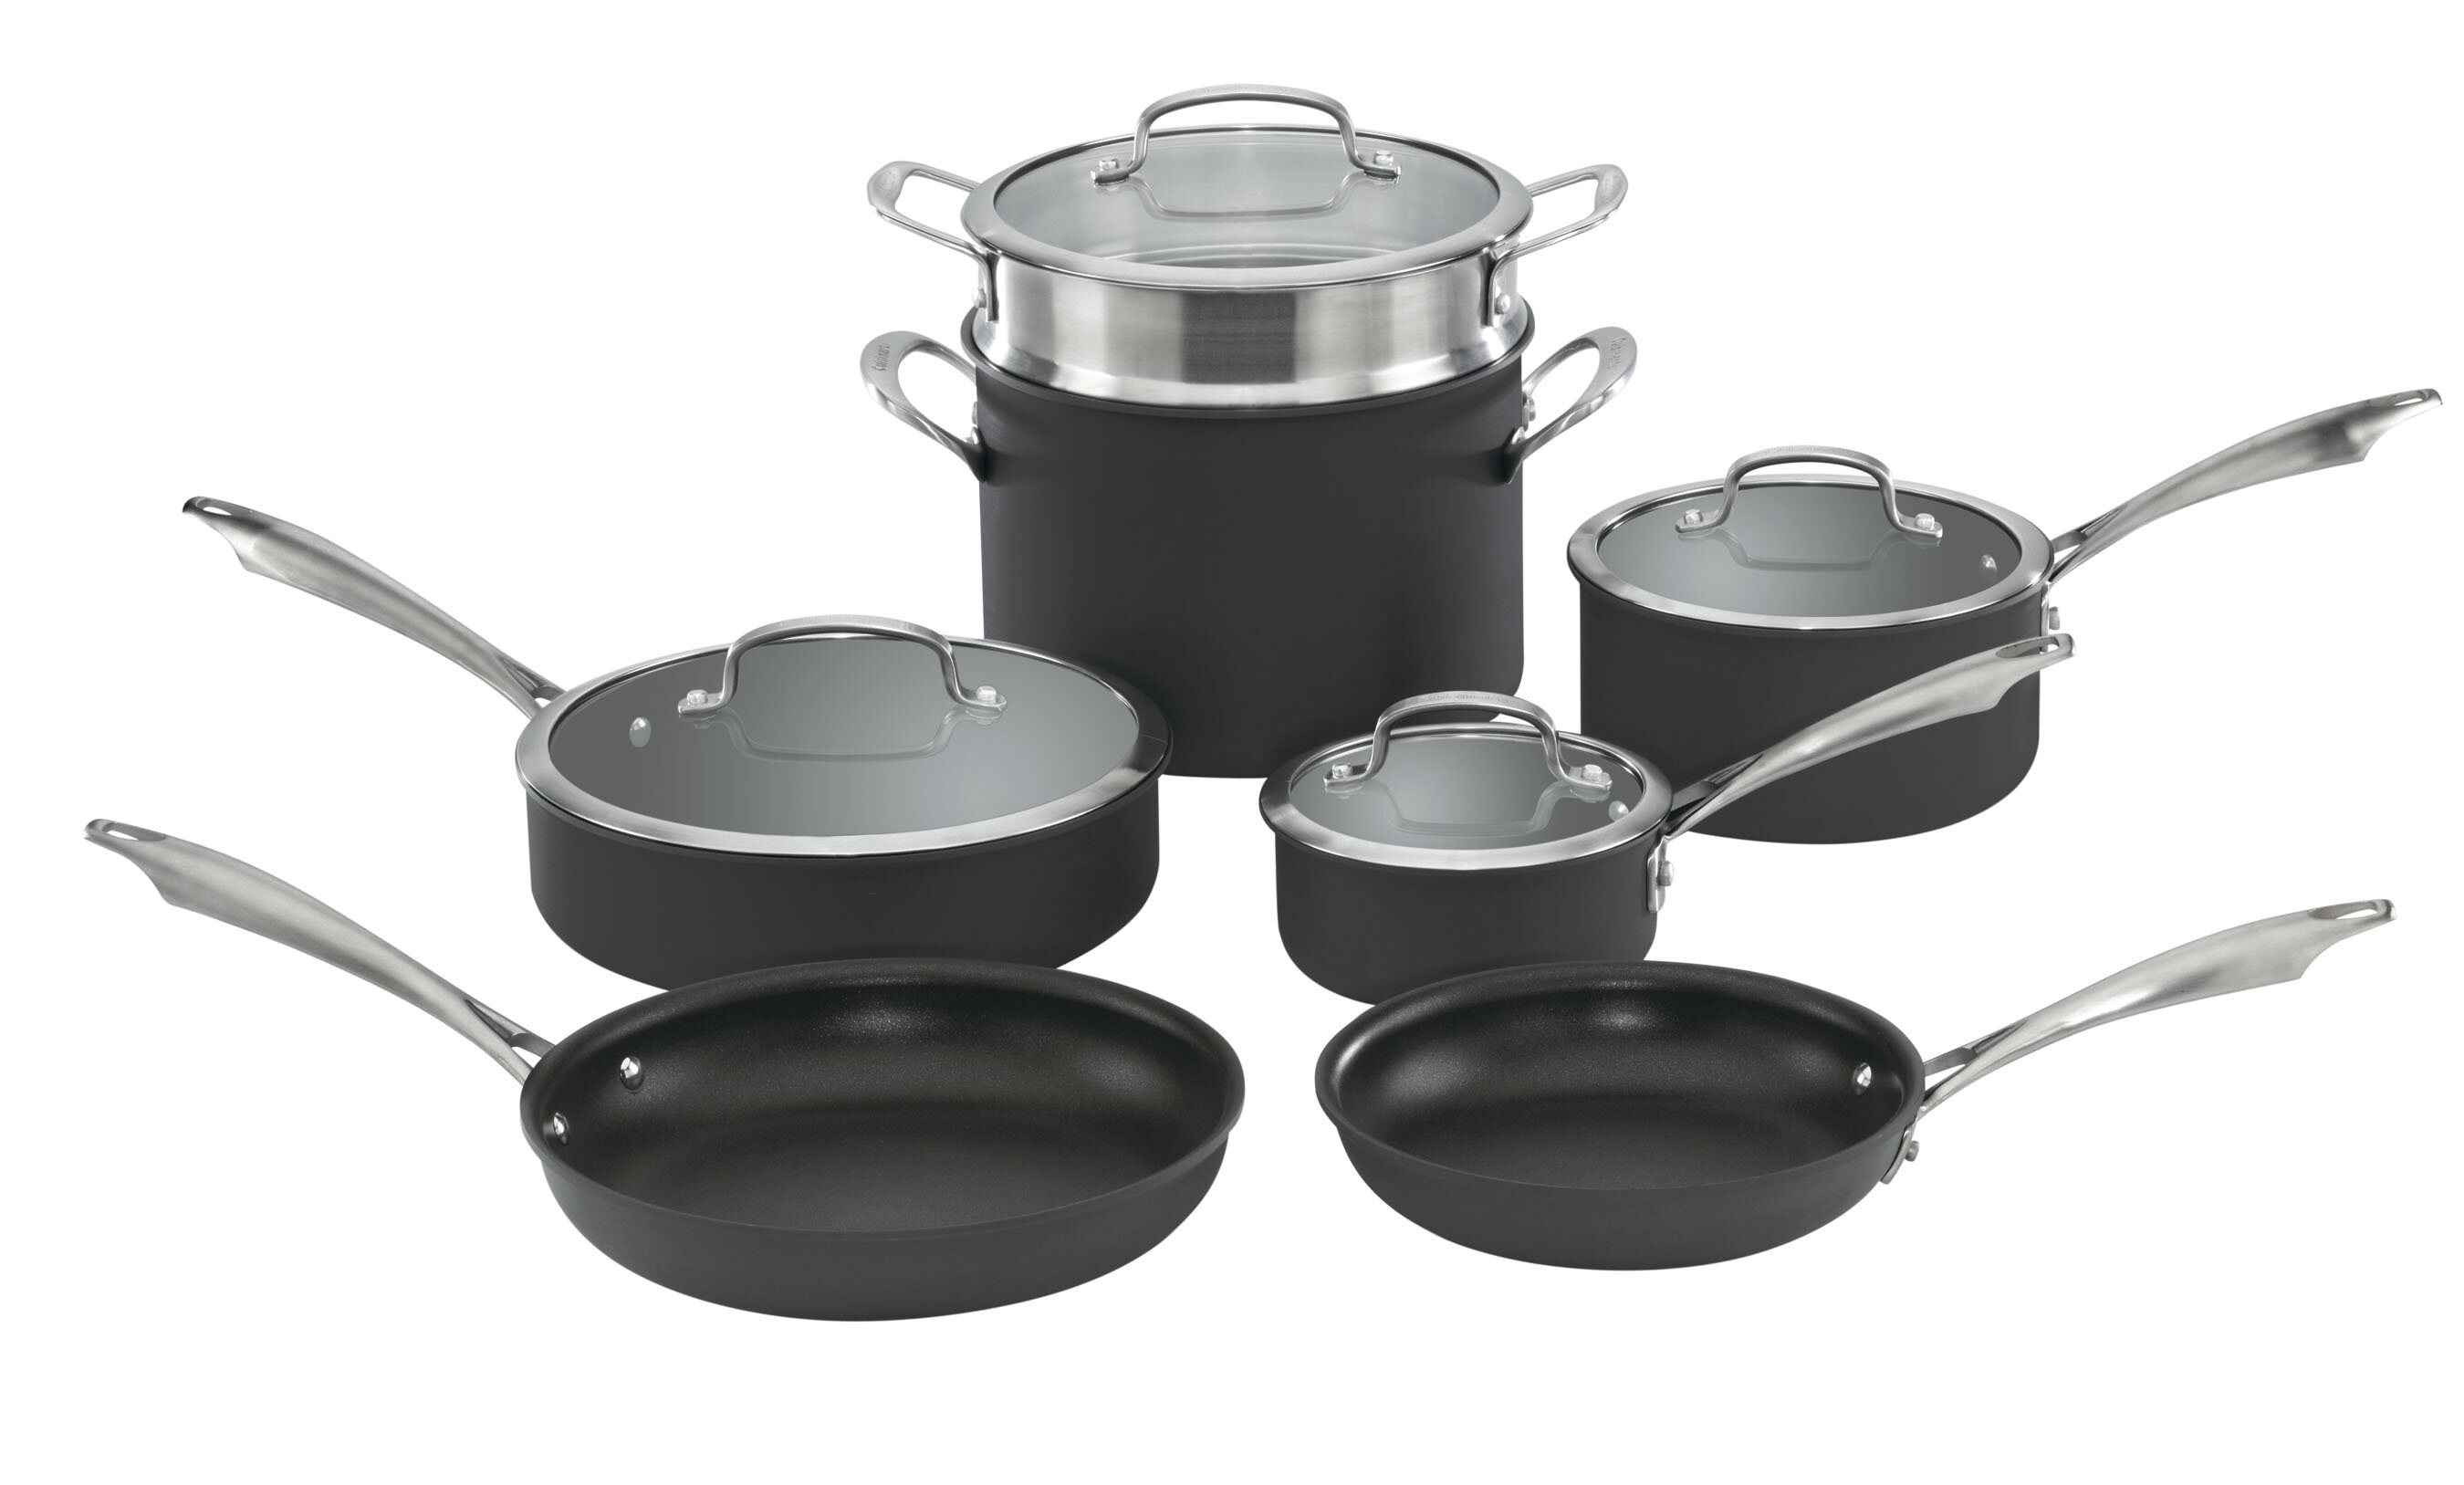 Cookware Set Stainless Steel Kitchen Pots Pans Dishwasher Safe Aluminum Nonstick